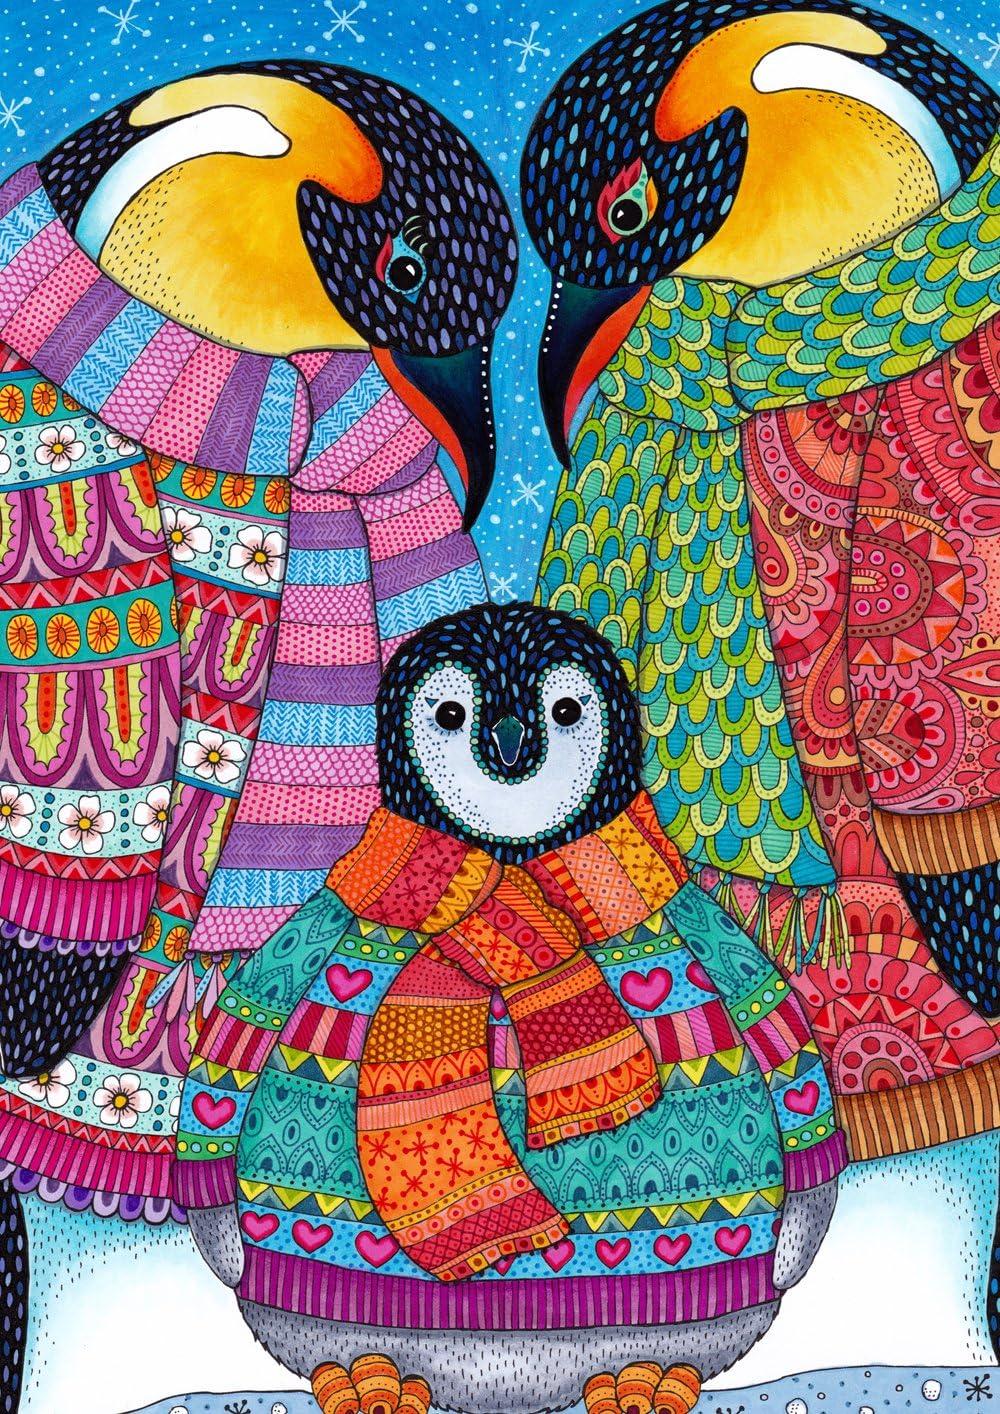 Toland Home Garden Penguin Parents 12.5 x 18 Inch Decorative Colorful Winter Snow Animal Scarf Garden Flag